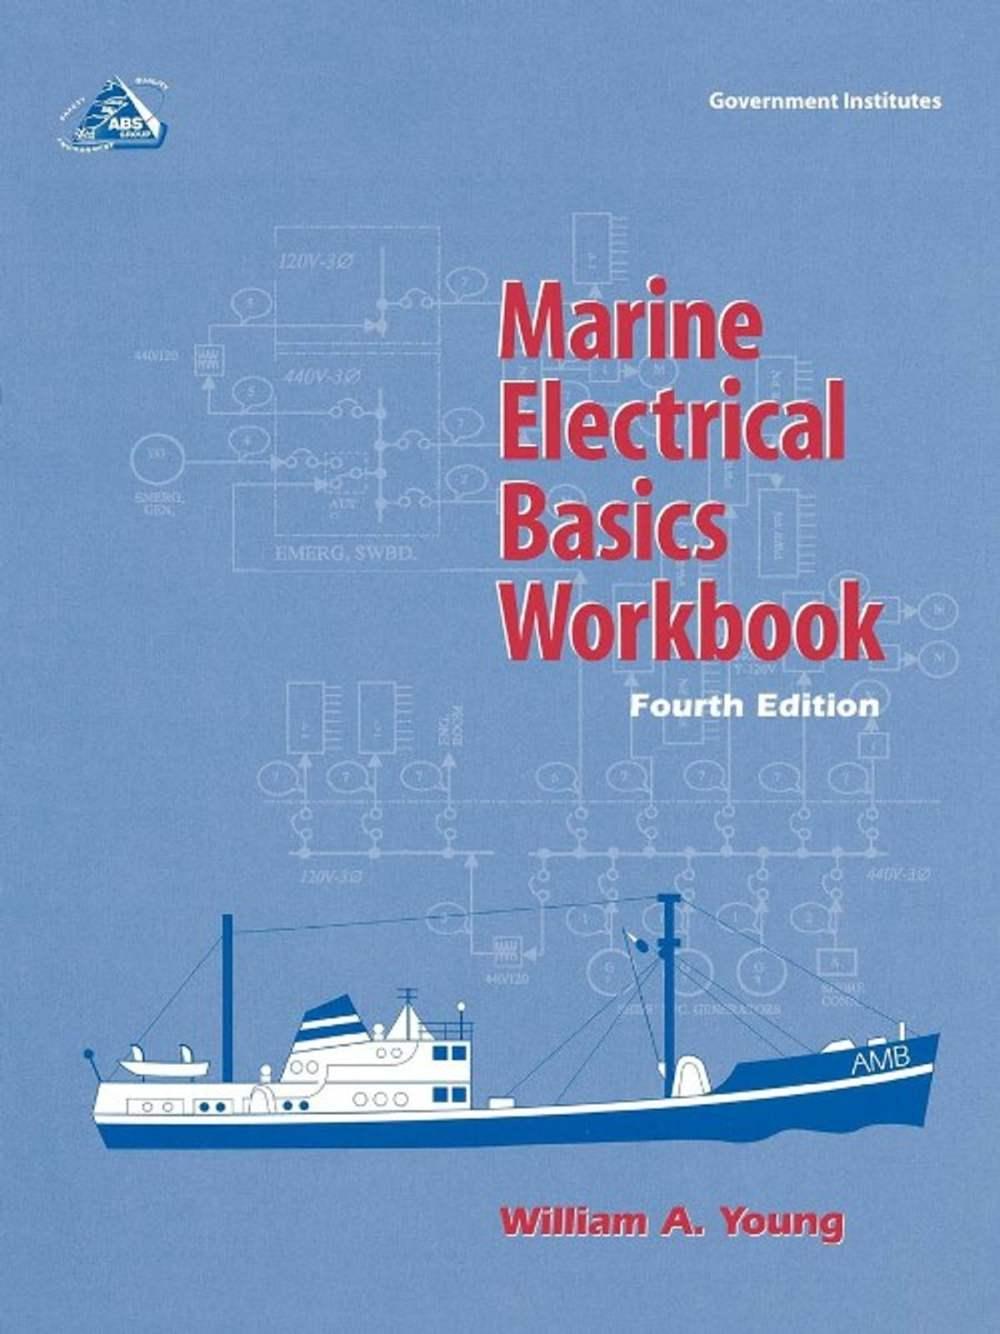 medium resolution of marine electrical basics workbook ebook by william a young 9781461624752 rakuten kobo